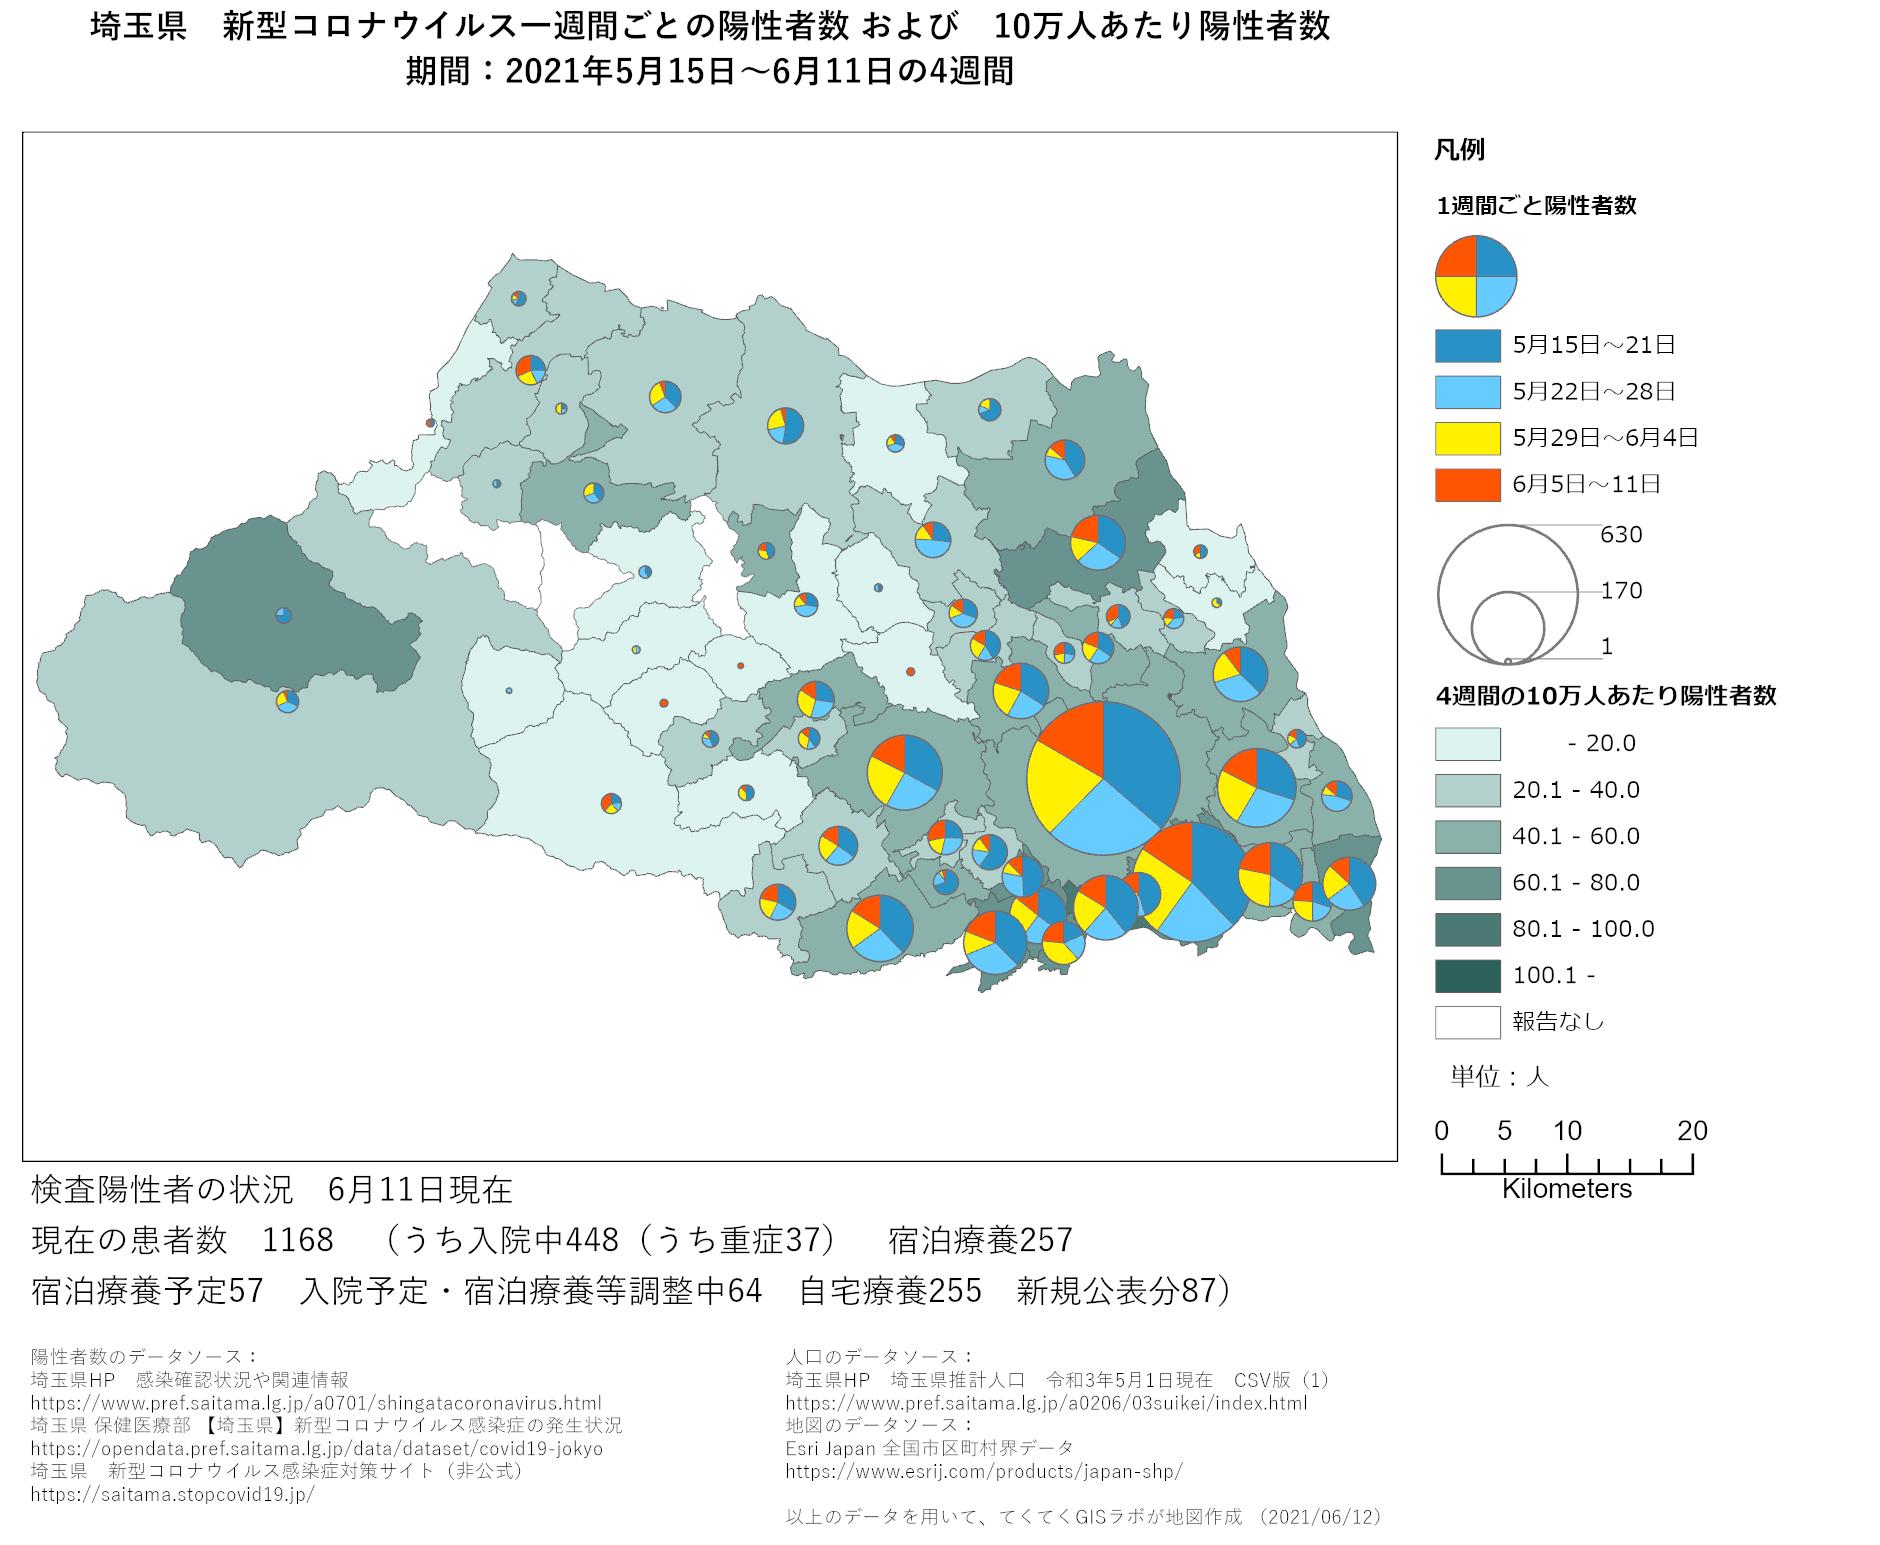 1週間ごと感染者数、埼玉県、5月15日〜6月11日